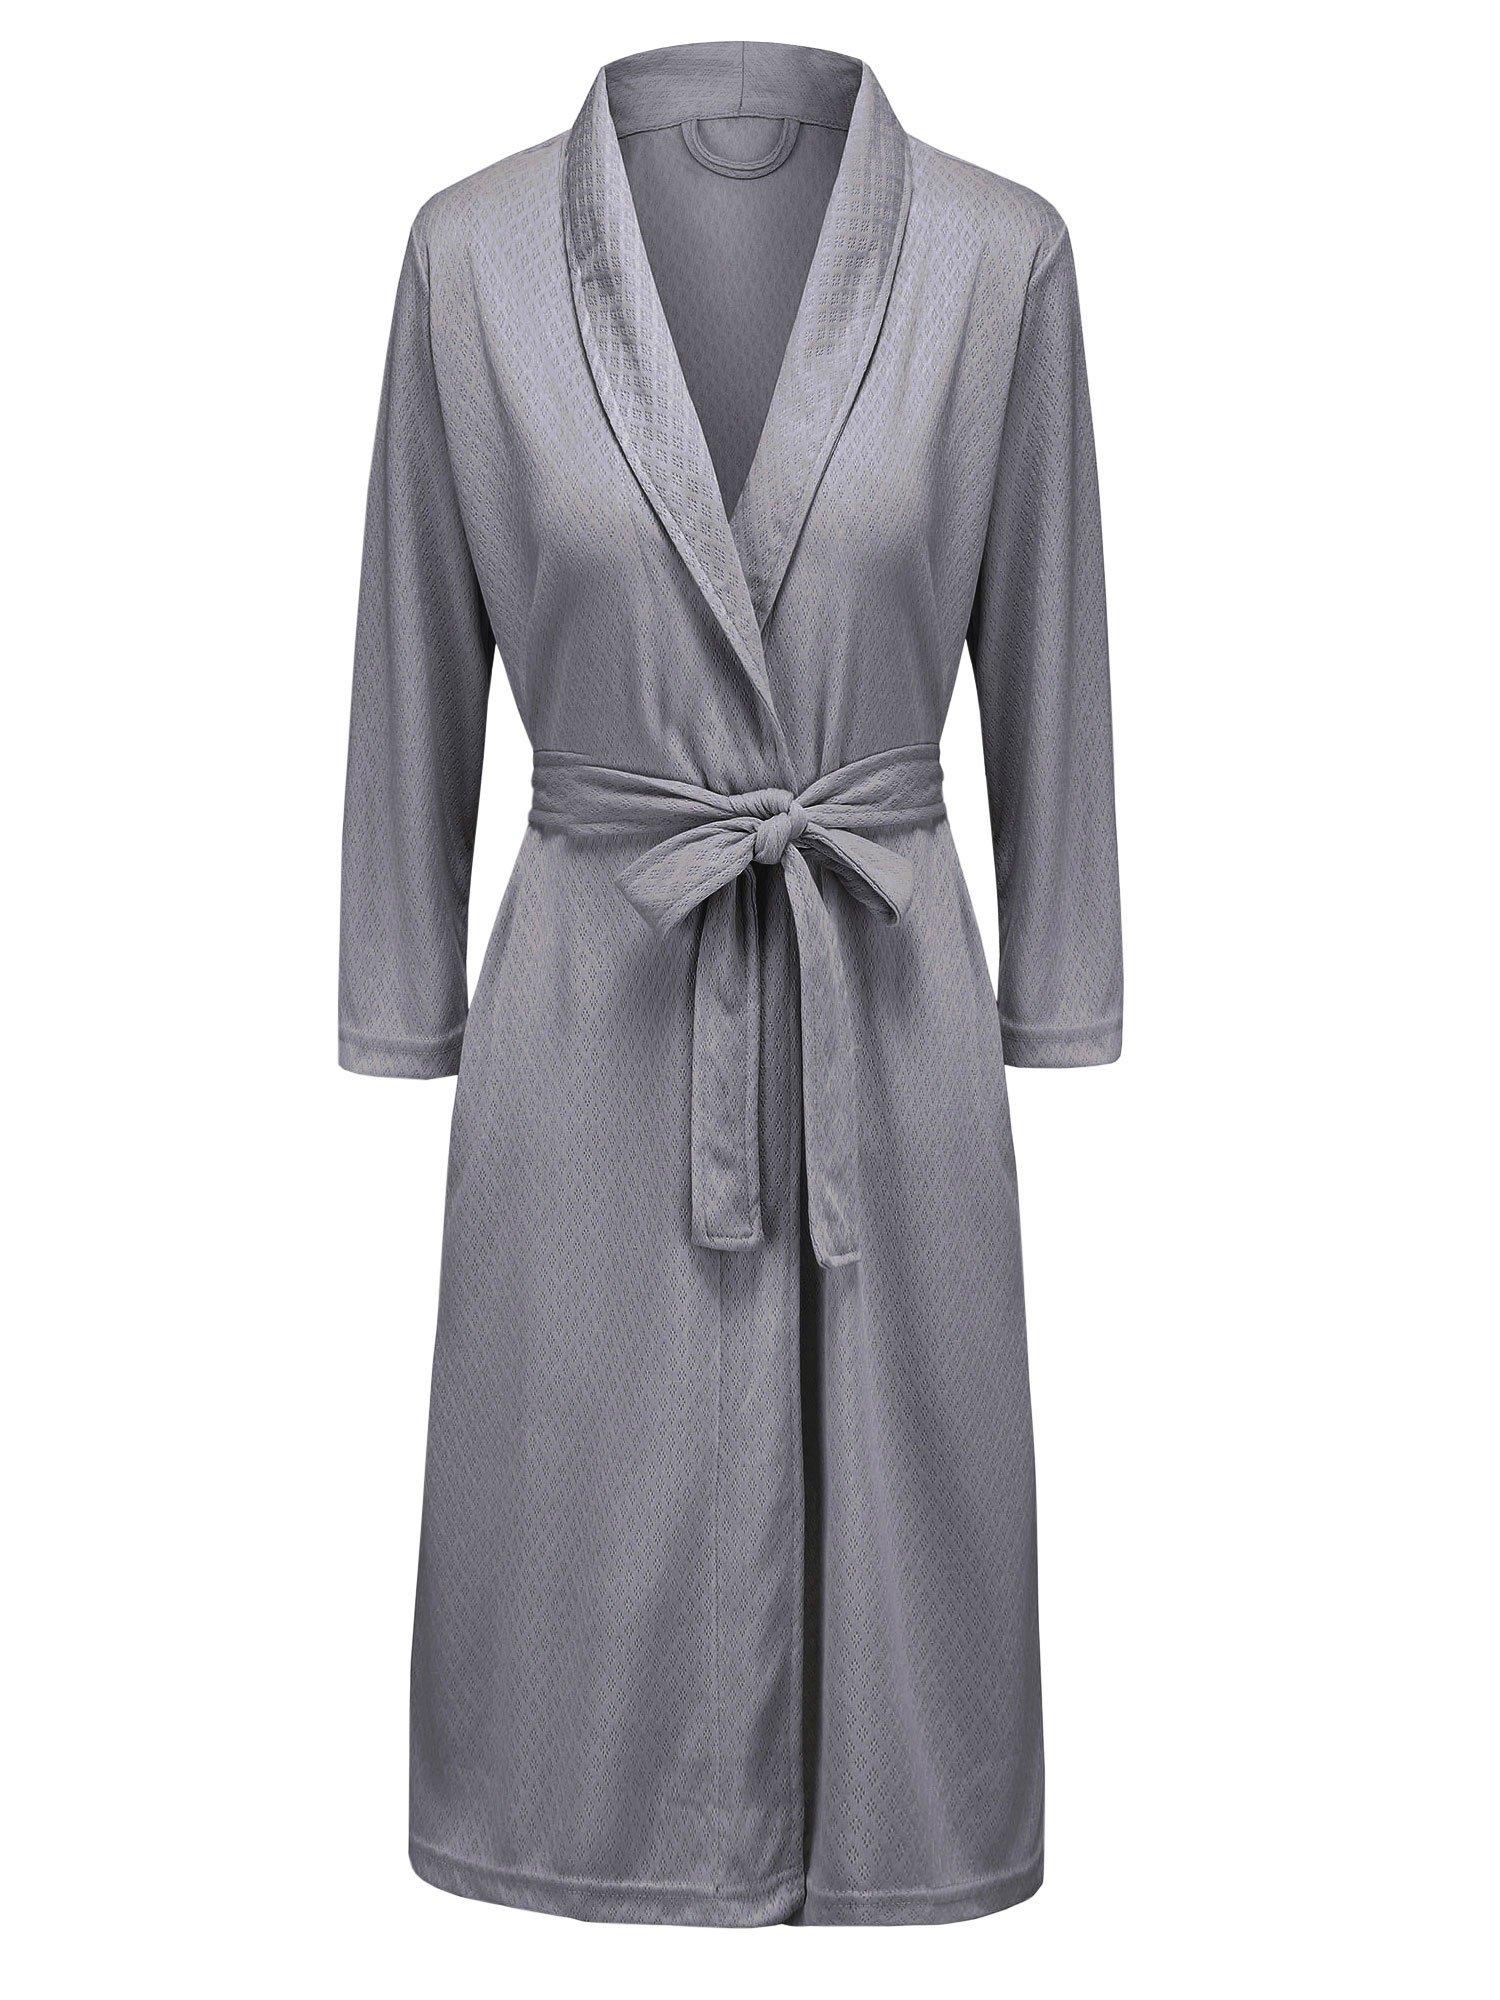 VI&VI Womens Soft Kimono Bathrobe Dressing Gown Lightweight Knee-Length Hotel Spa Robe (S/M, Gray)